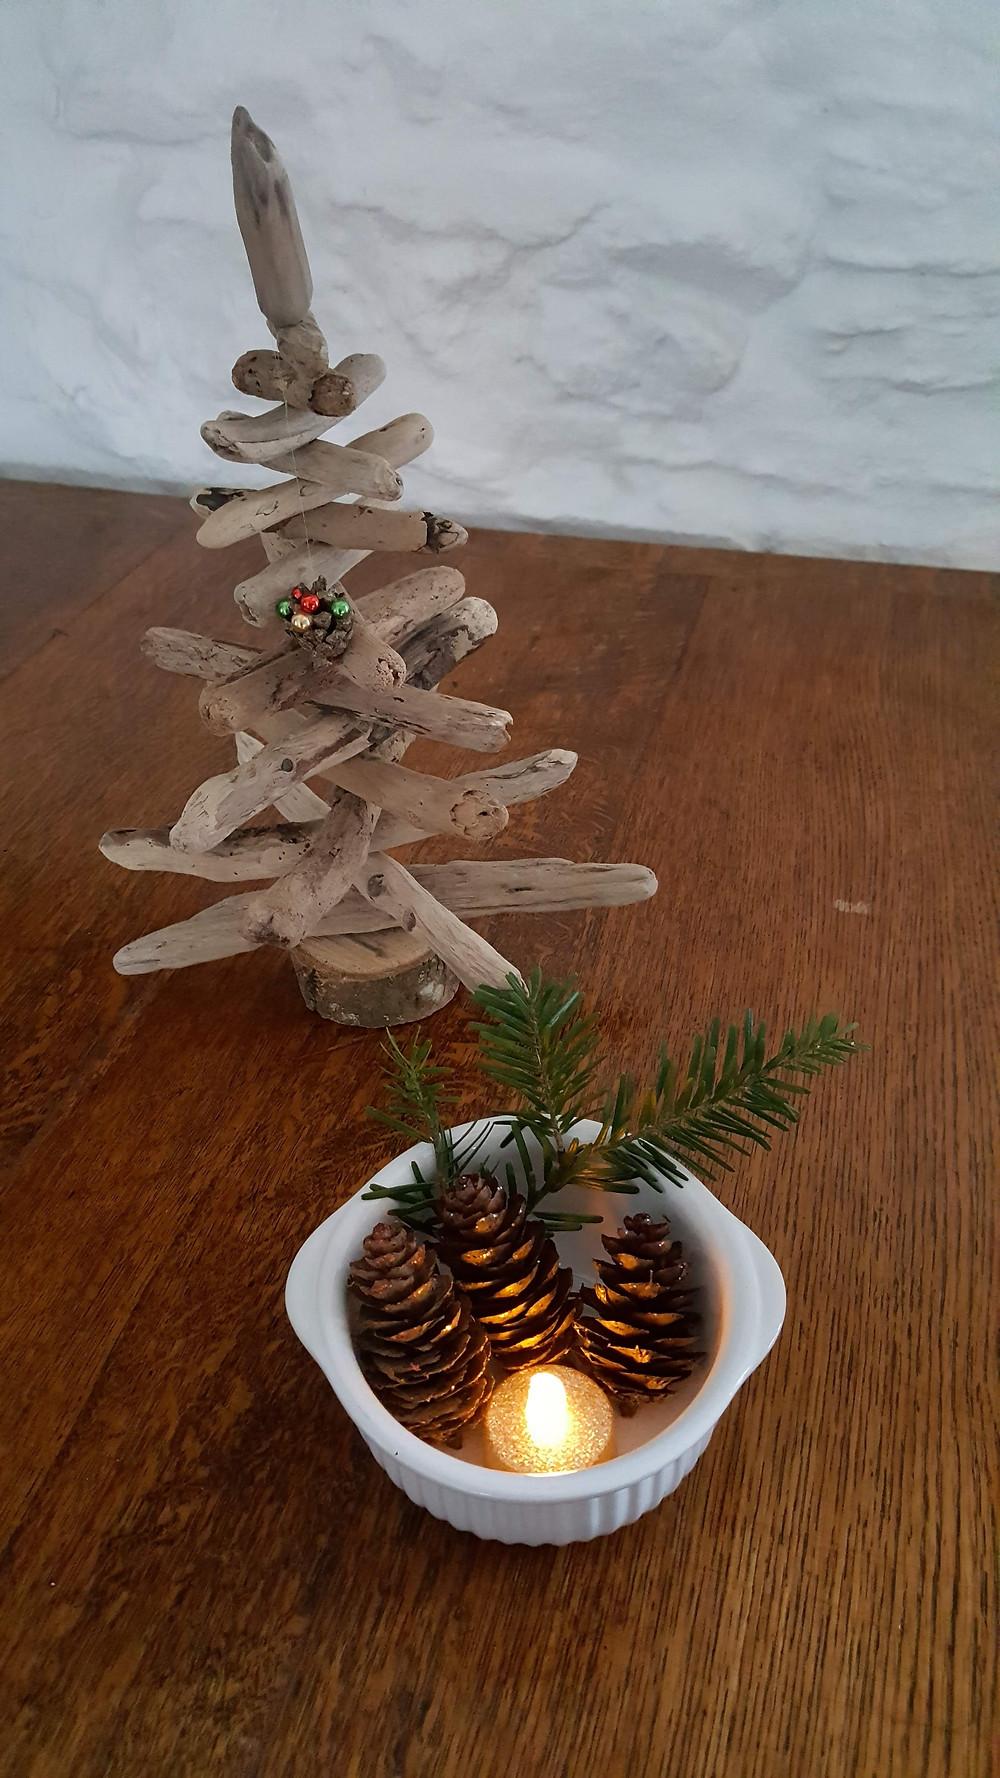 Christmas tree and candle.